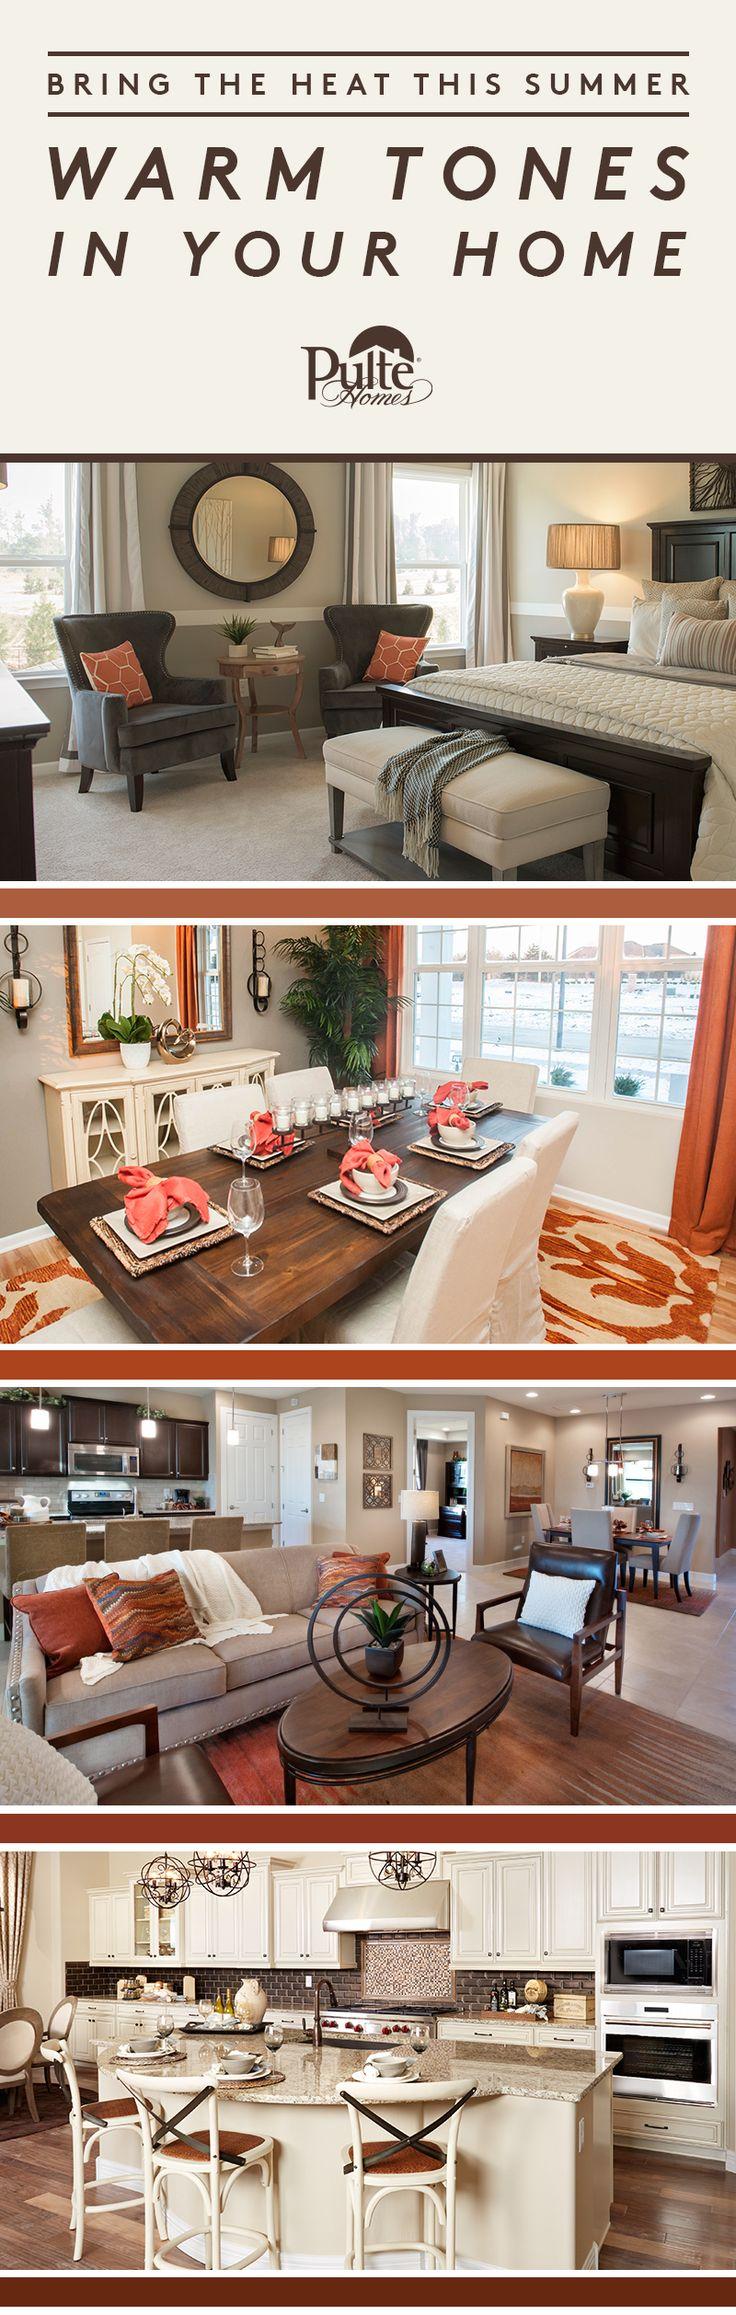 83 best Renovate & Remodel images on Pinterest | Pulte homes, Hue ...